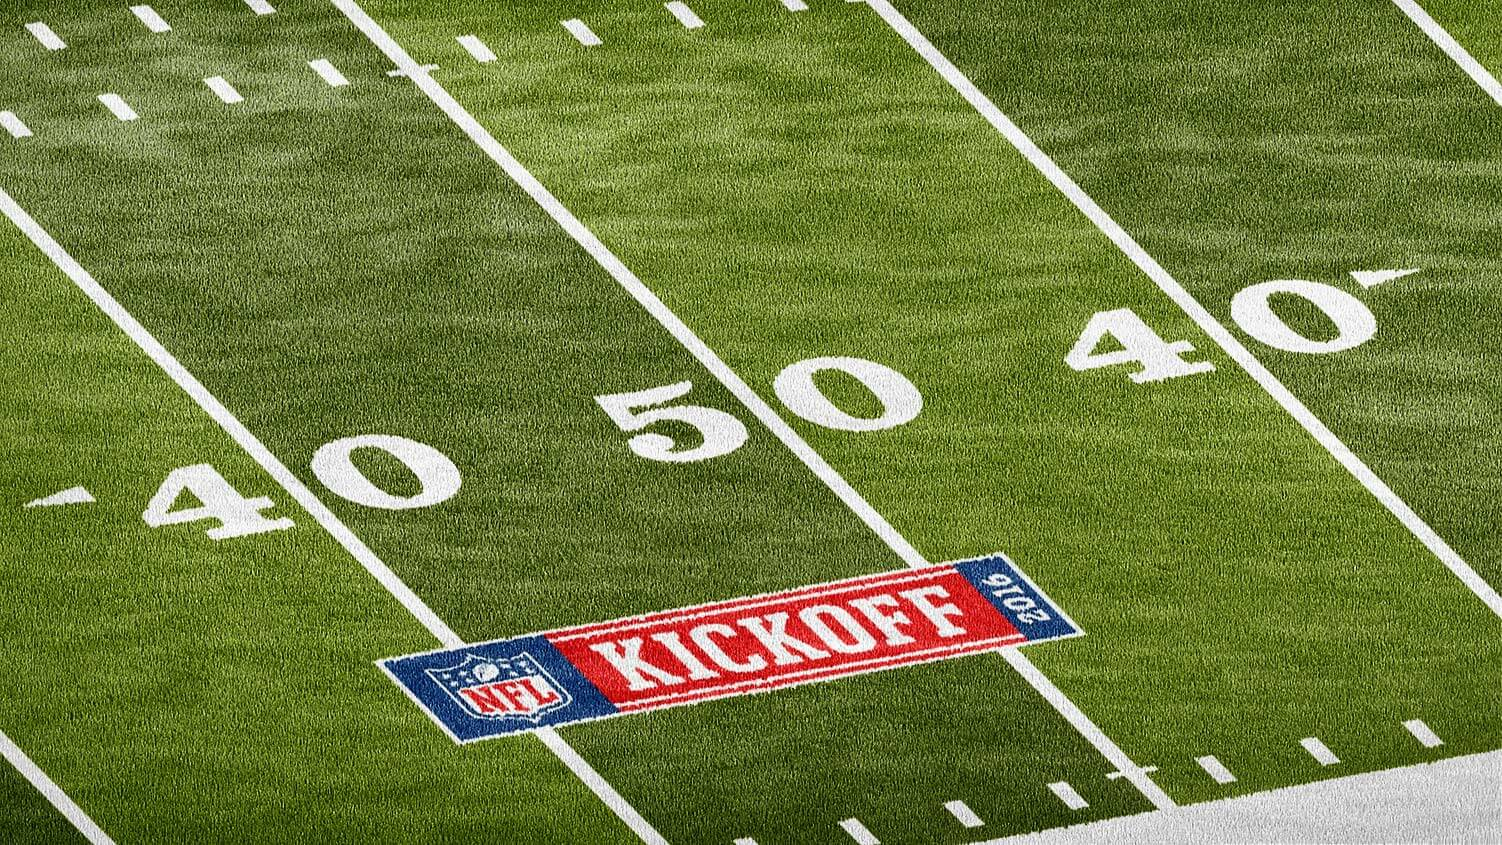 nfl Football midfield logo photoshop mockup